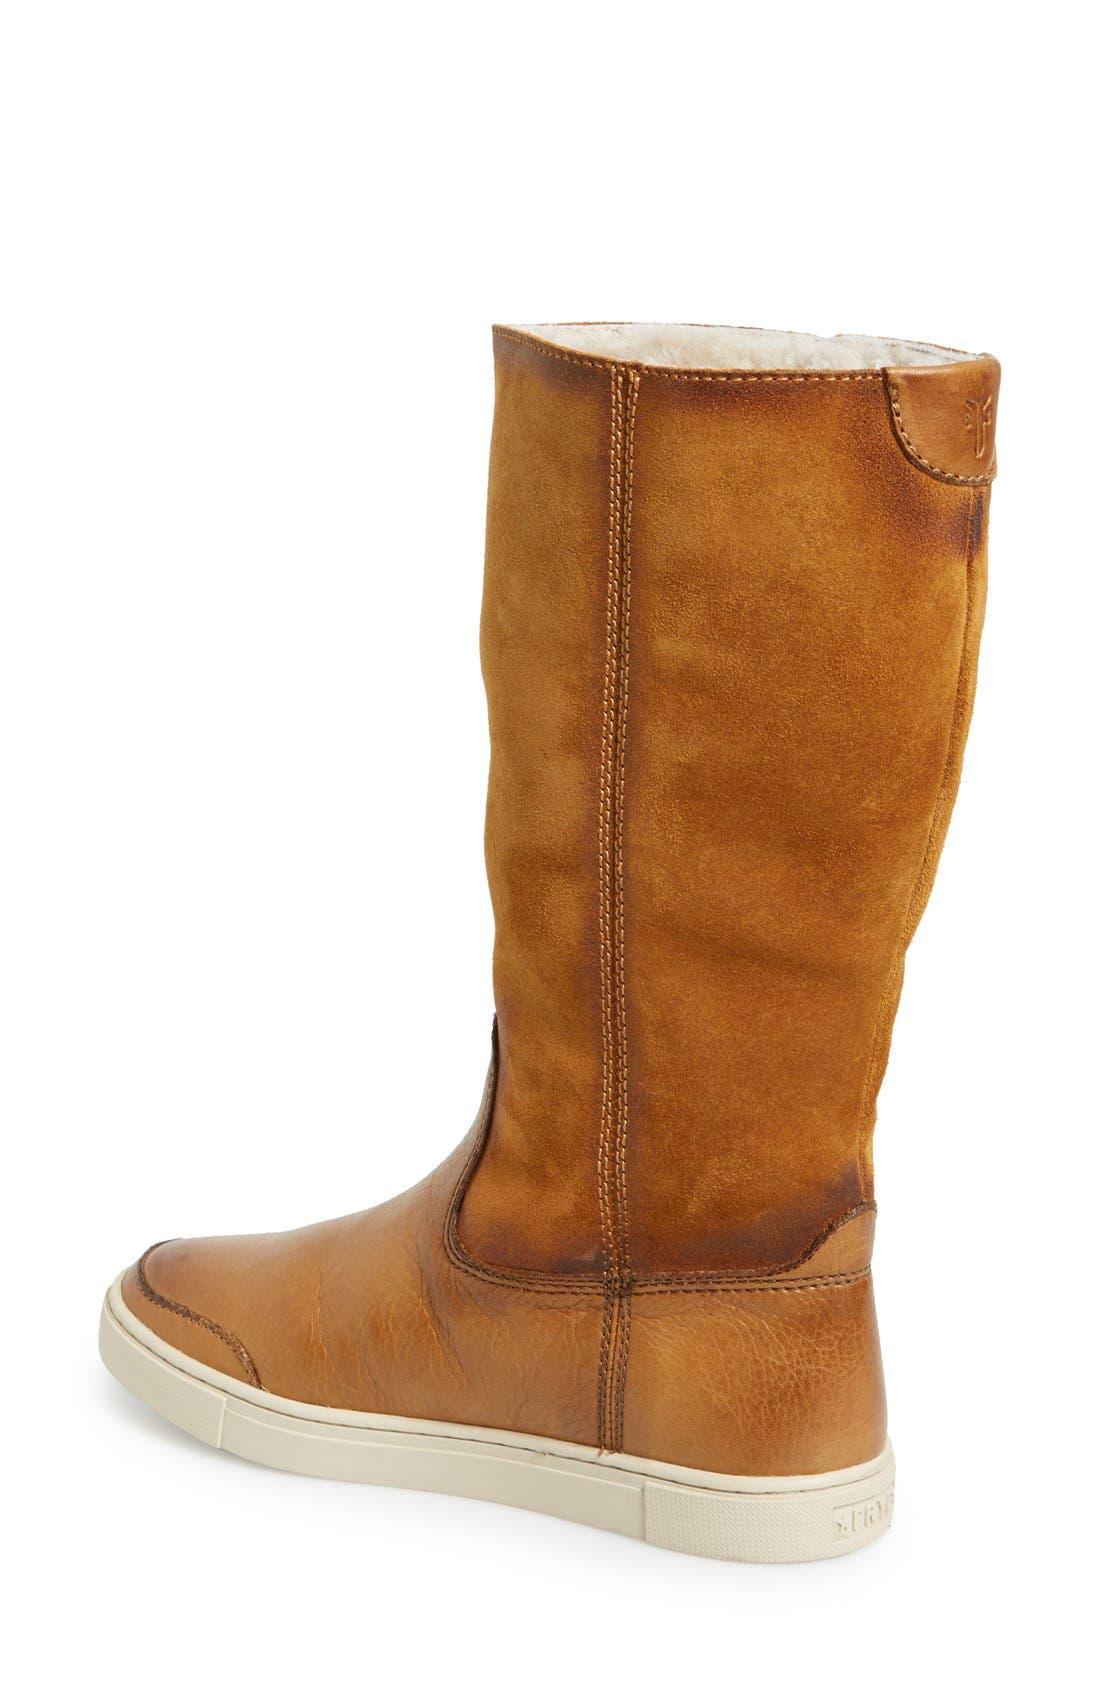 Alternate Image 2  - Frye 'Gemma' Tall Genuine Shearling Lined Boot (Women)